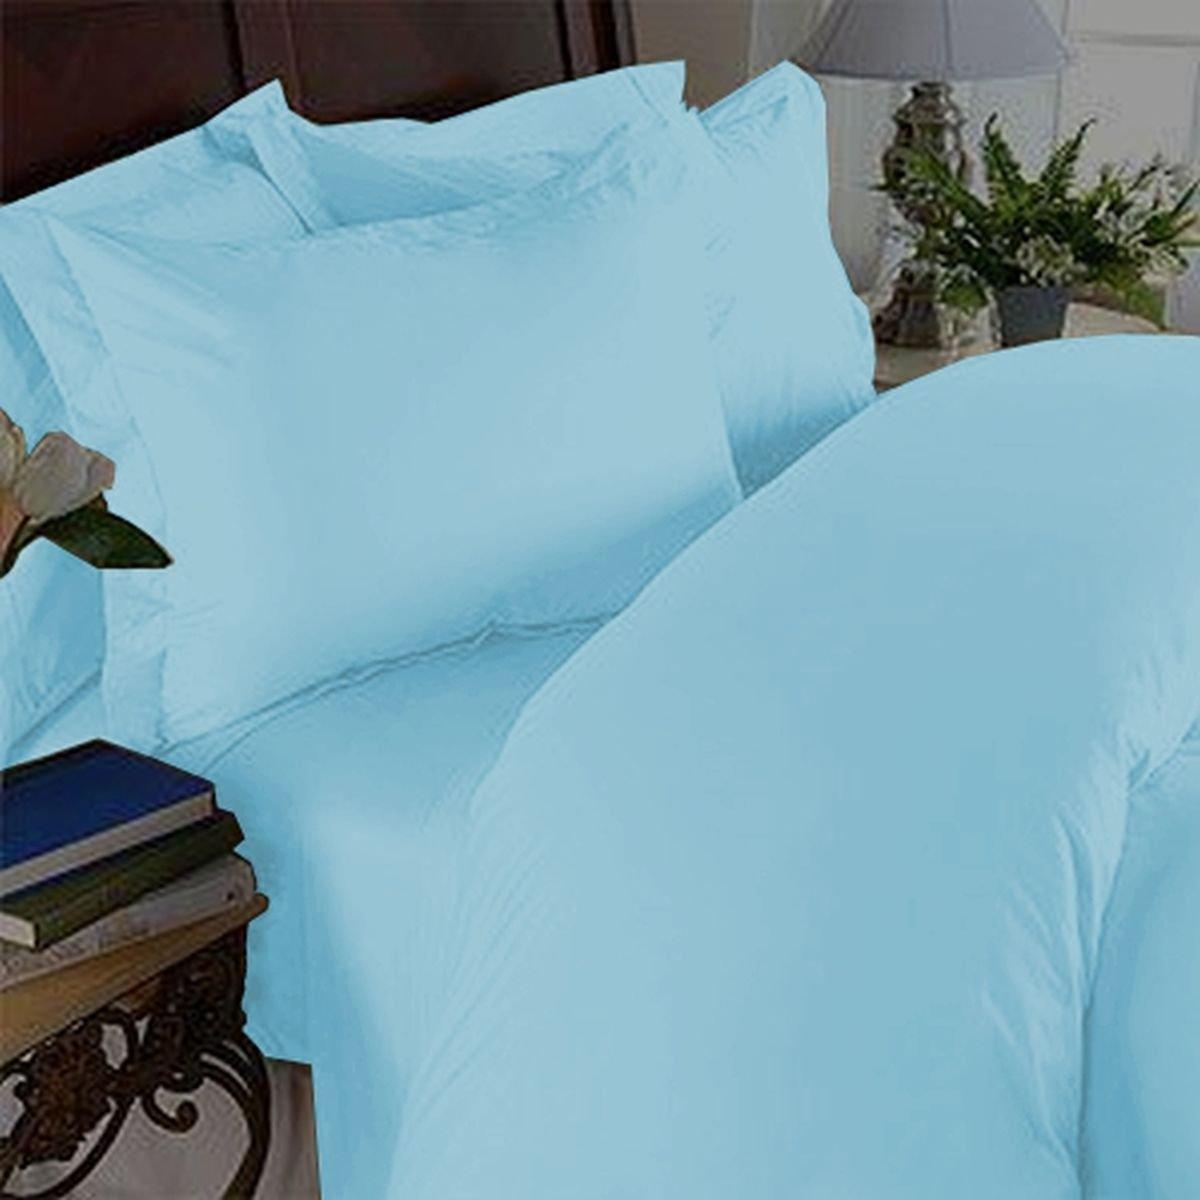 DVT K Aqua Elegant Comfort 3 Piece 1500 Thread Count Luxury Ultra Soft Egyptian Quality Coziest Duvet Cover Set Aqua Blue 32RW King//California King